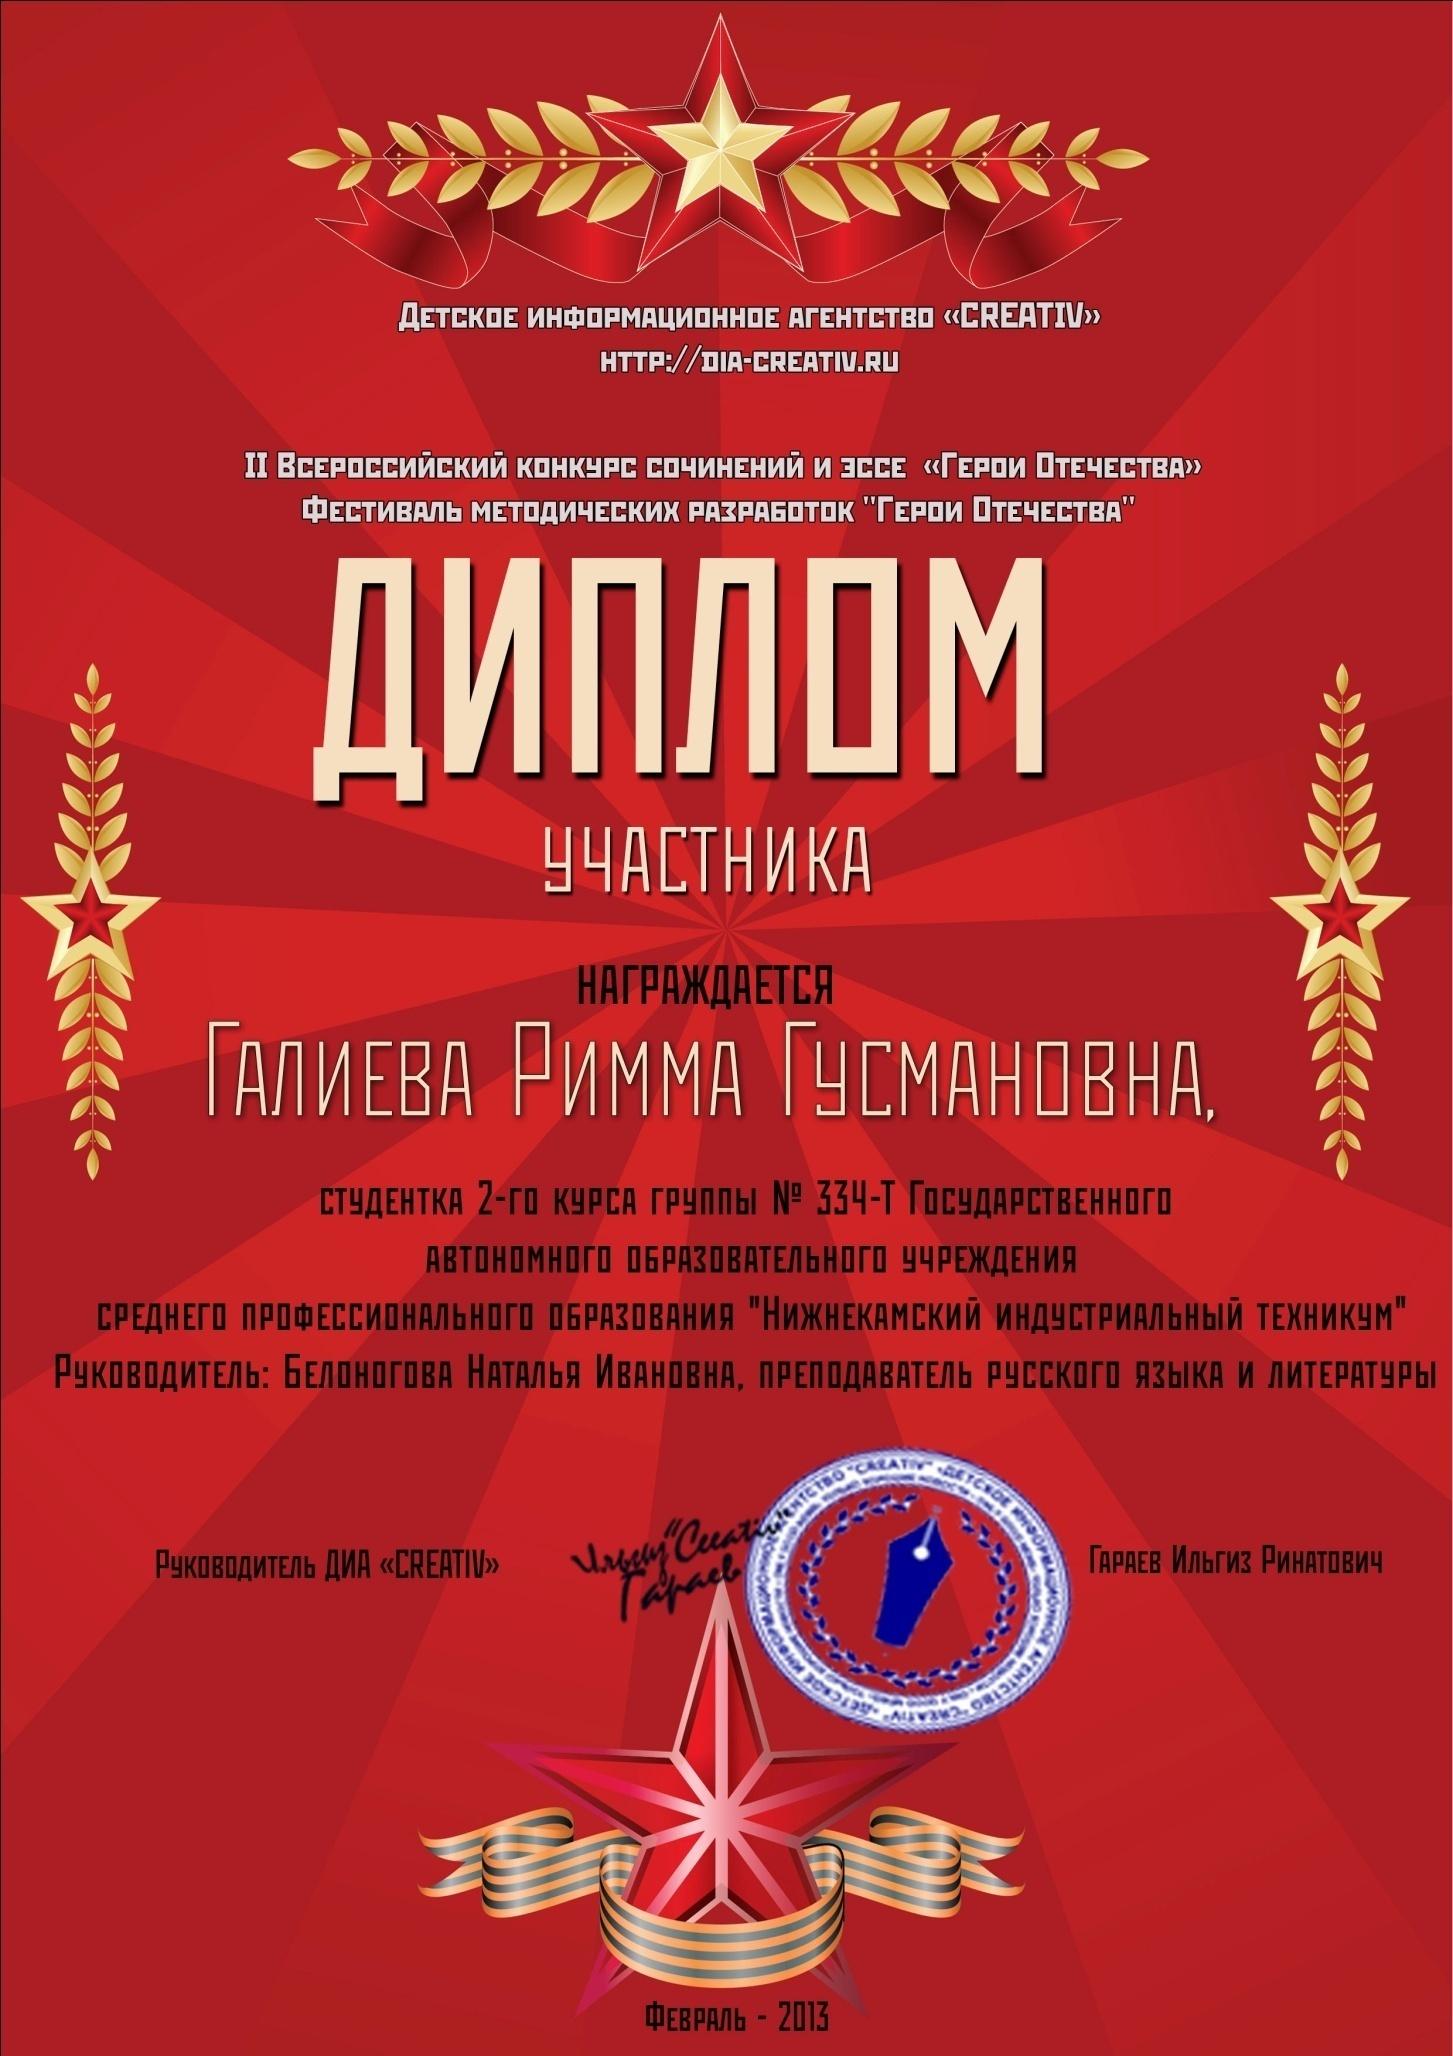 F:\Всероссйский конкурс Портфолио выпускника\РИММА\1.jpg